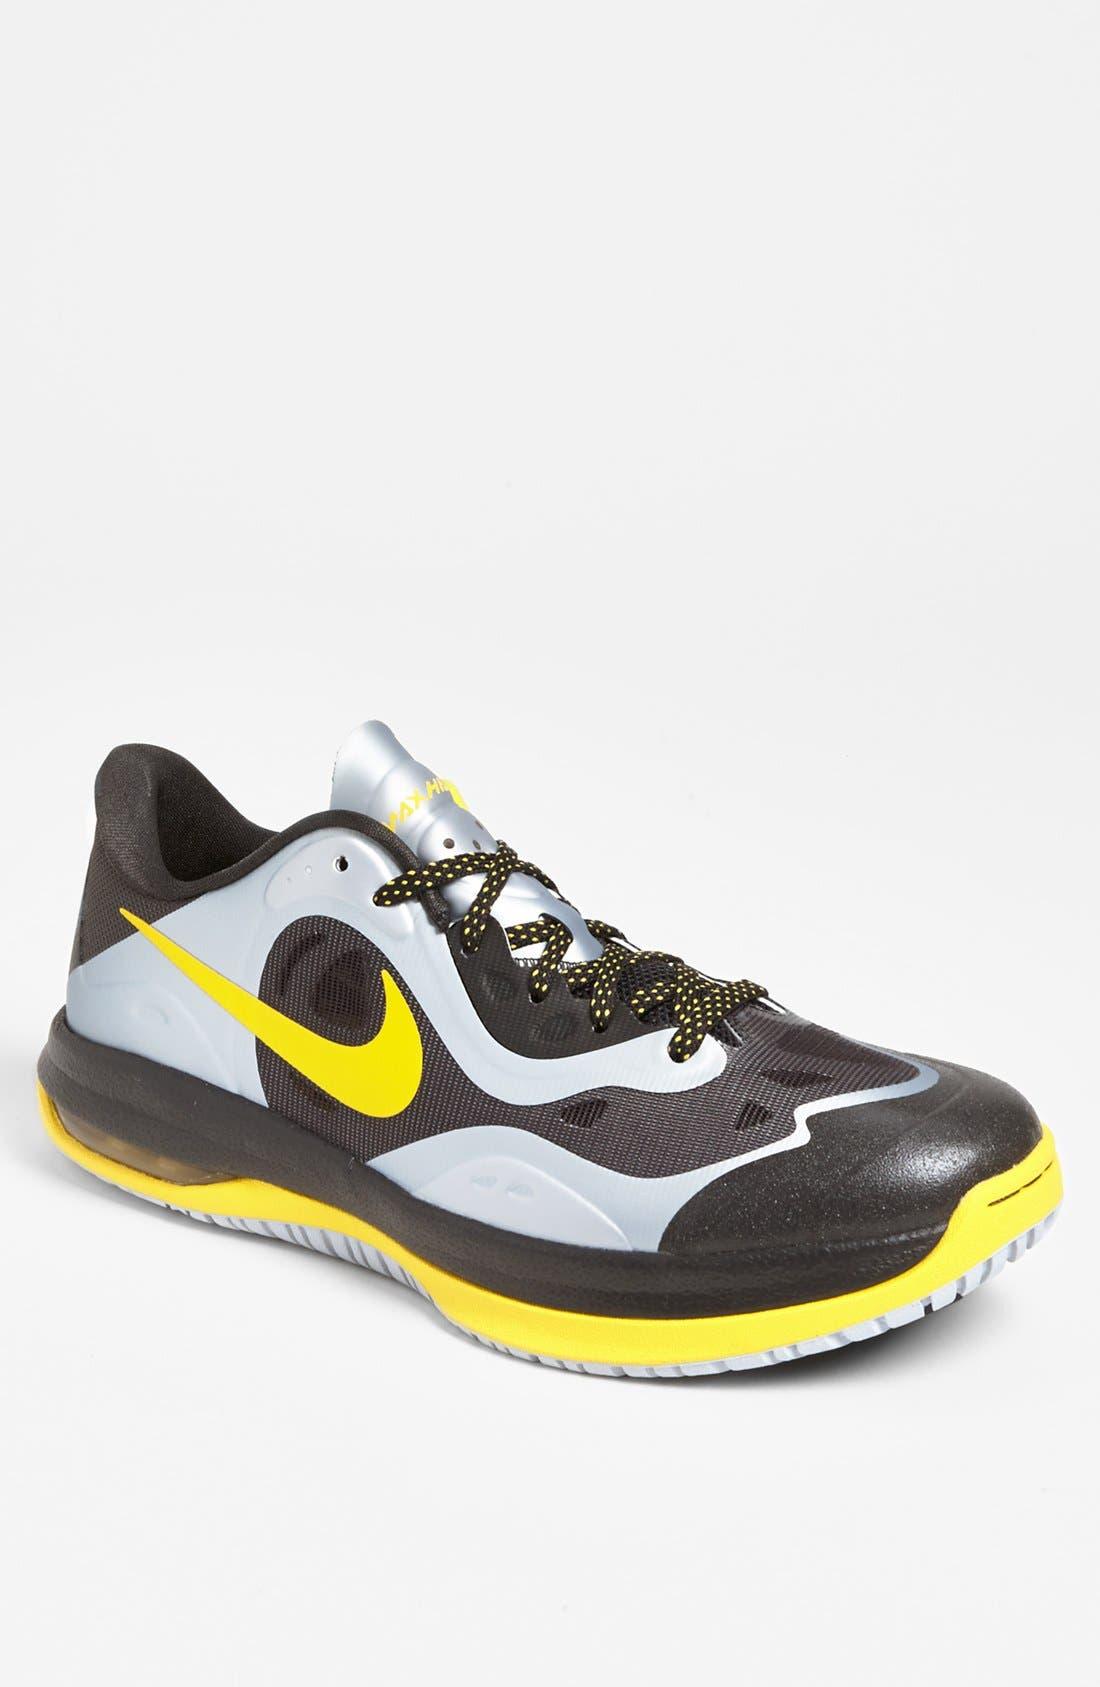 Alternate Image 1 Selected - Nike 'Max H.A.M. Low' Basketball Shoe (Men)